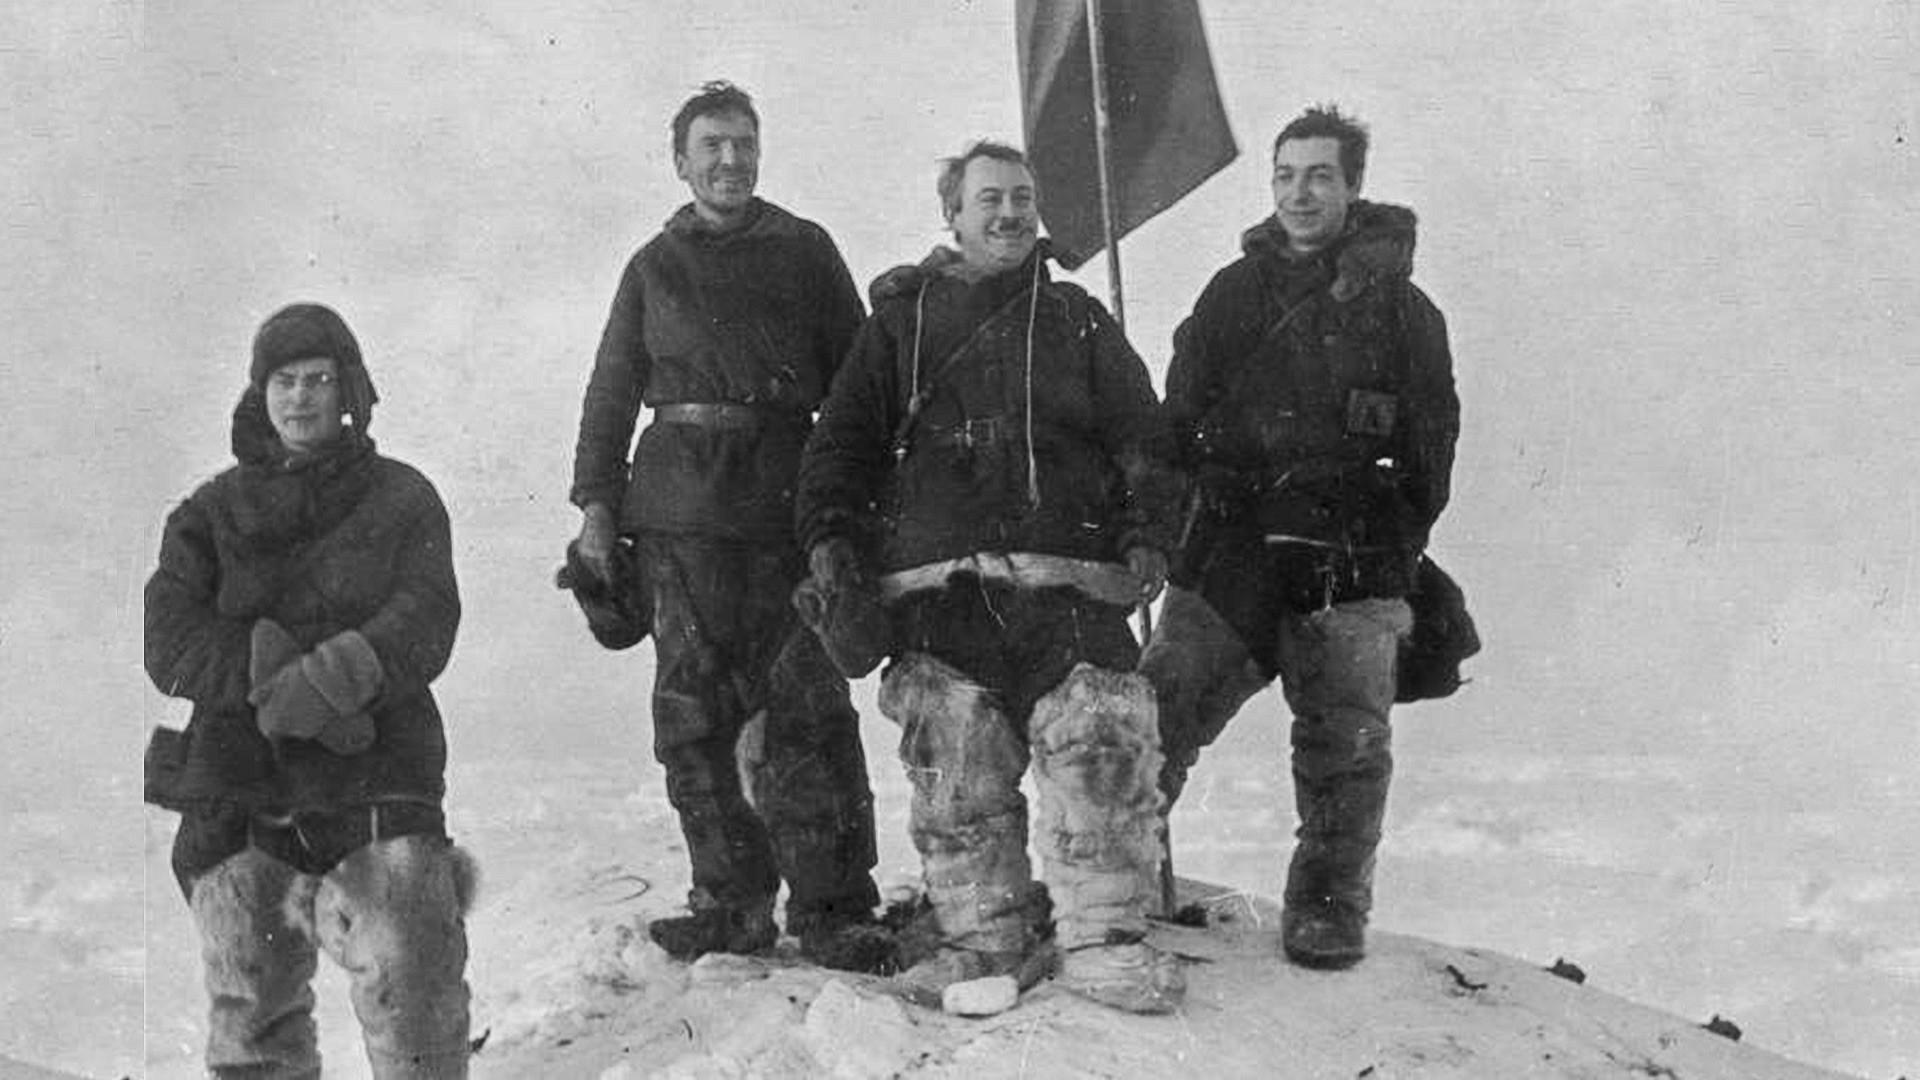 Piotr Chirchov, Ernst Krenkel, Ivan Papanine et Evgueni Fiodorov